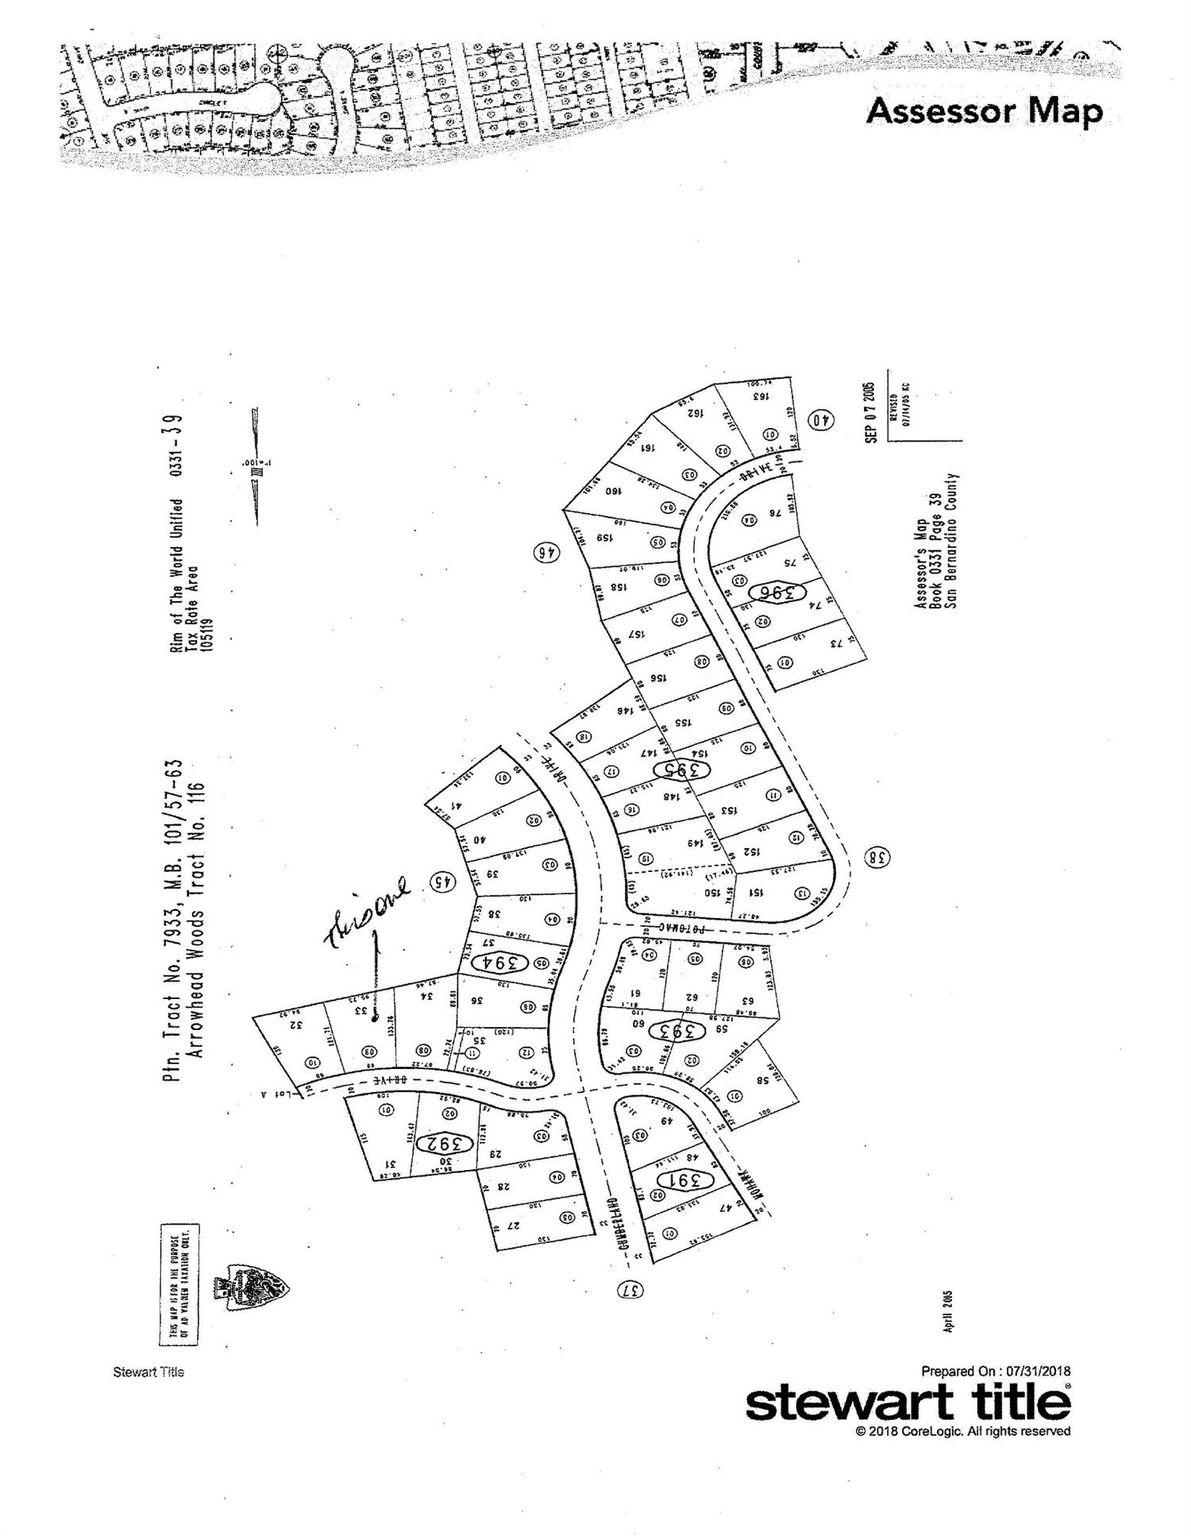 Diagram of elevation lake arrowhead data wiring diagrams 28989 mohawk dr lake arrowhead ca 92352 trulia rh trulia com lake arrowhead resort lake arrowhead publicscrutiny Gallery